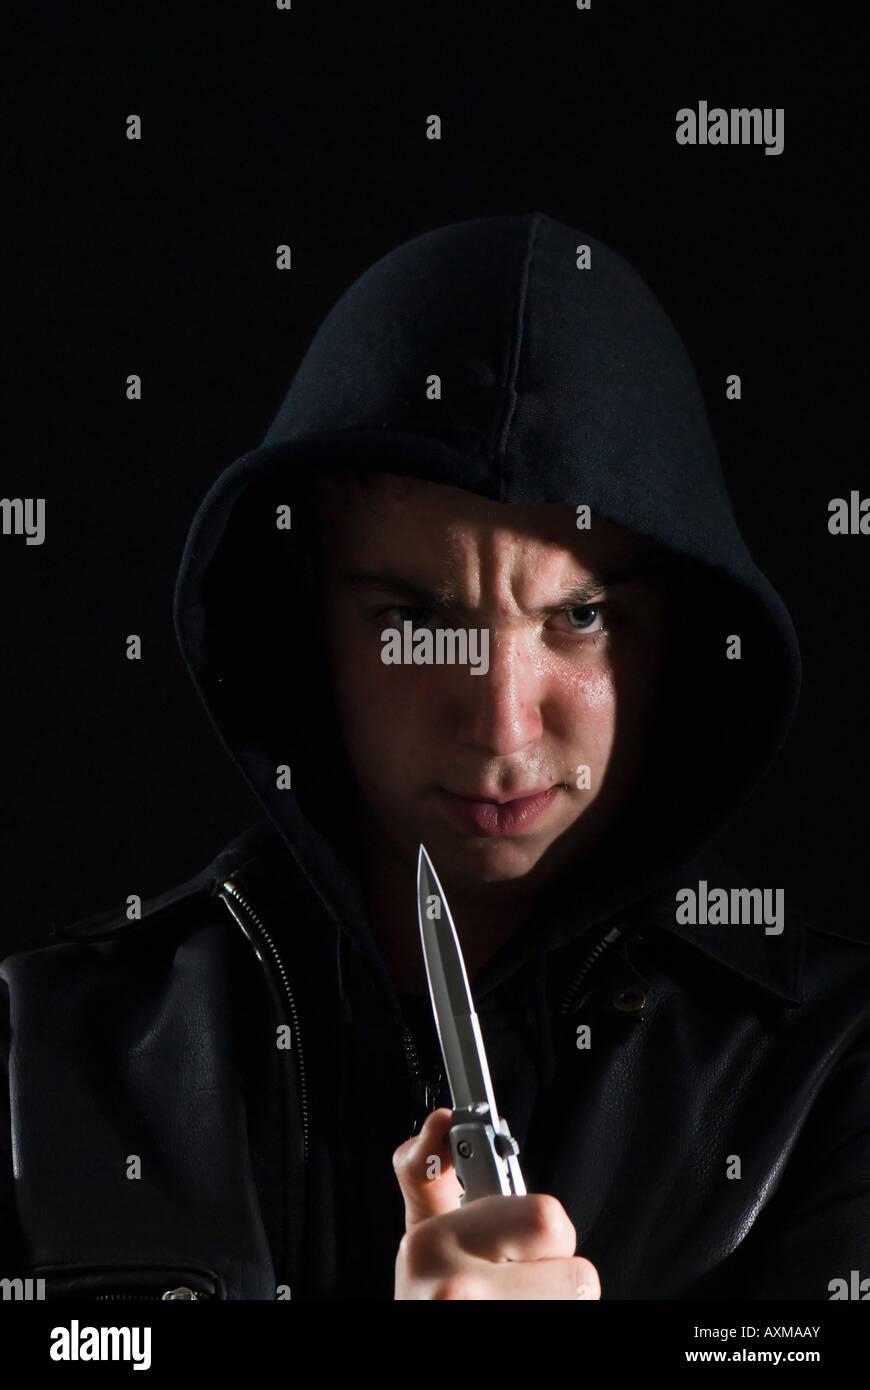 Teenage thug in hoody with knife - Stock Image